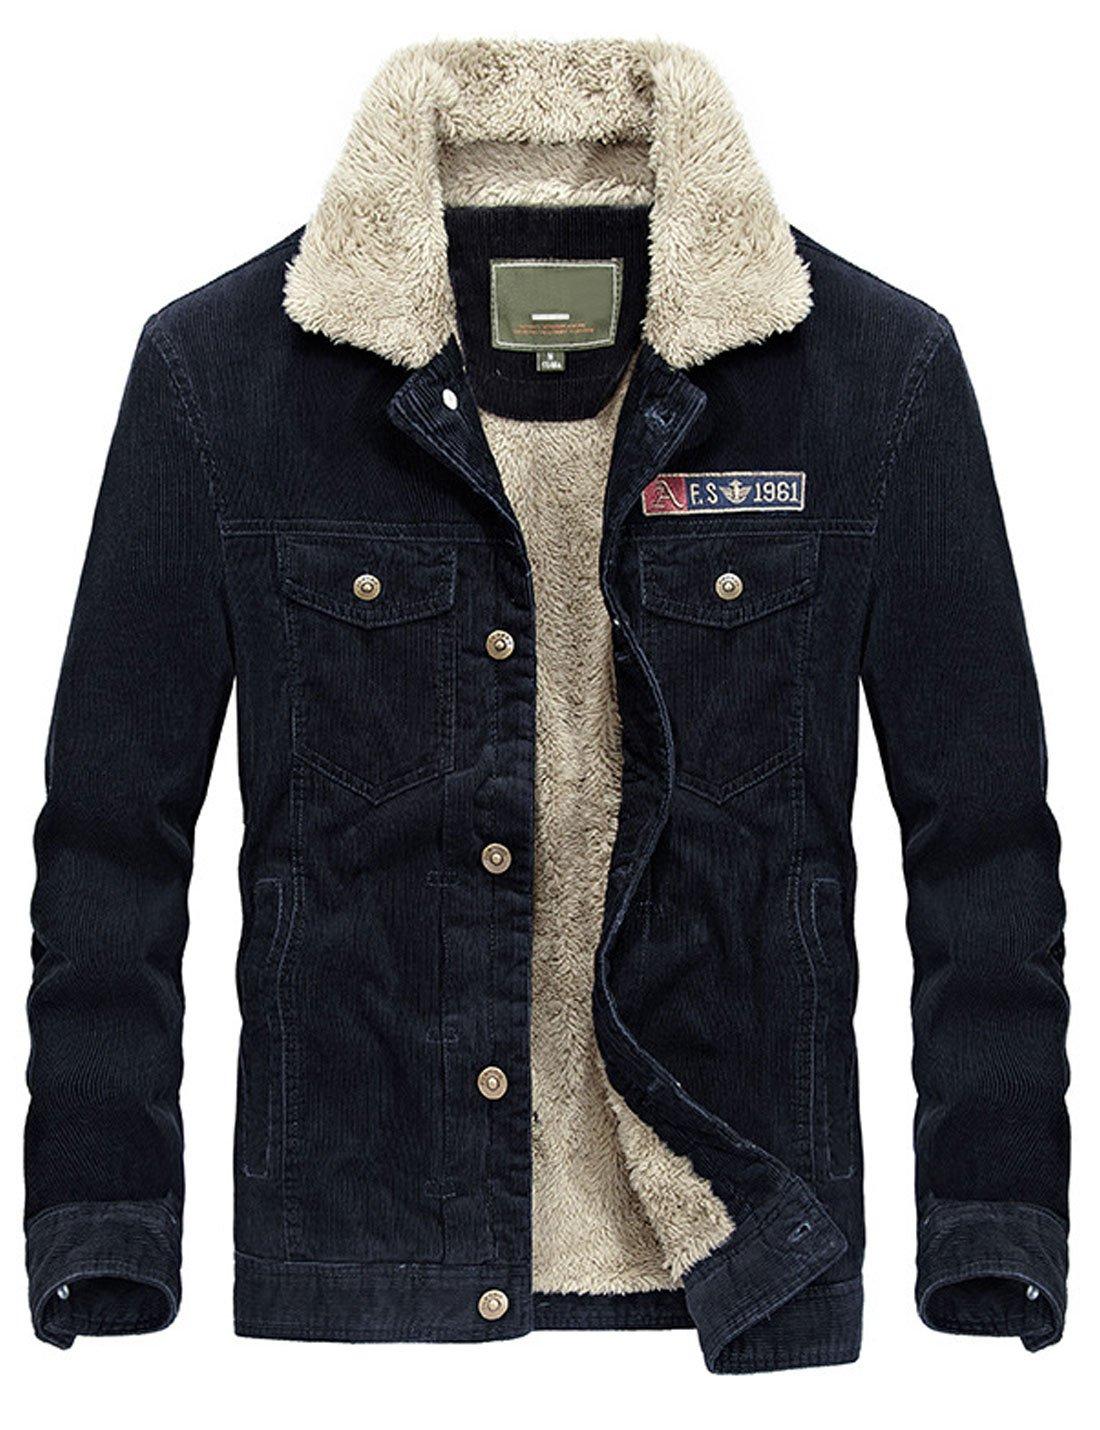 Yeokou Men's Vintage Slim Sherpa Lined Shearling Corduroy Trucker Jacket (X-Large, Black) by Yeokou